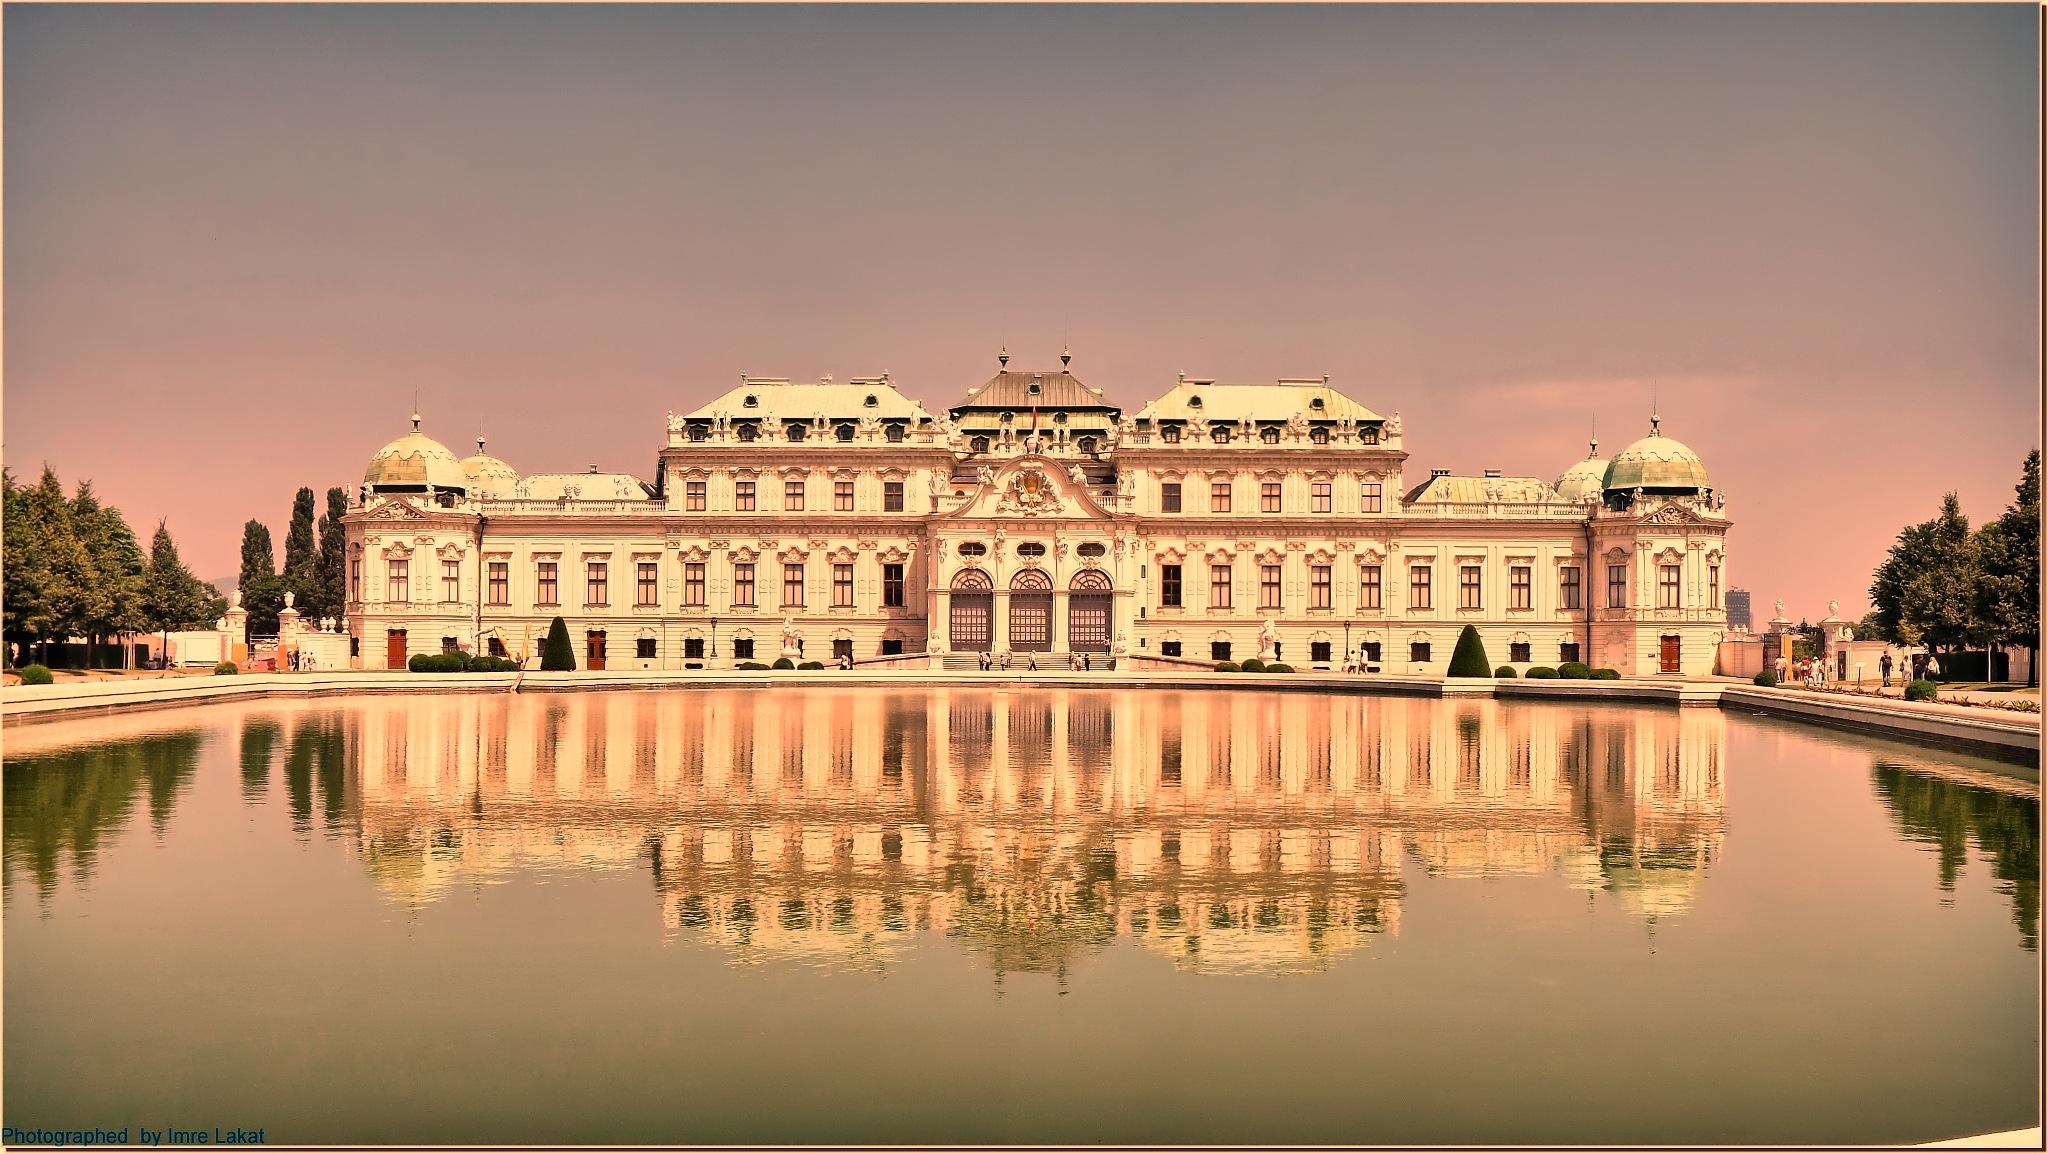 Belvedere Palace in Belvedere Schlossgarten  by Imre Lakat